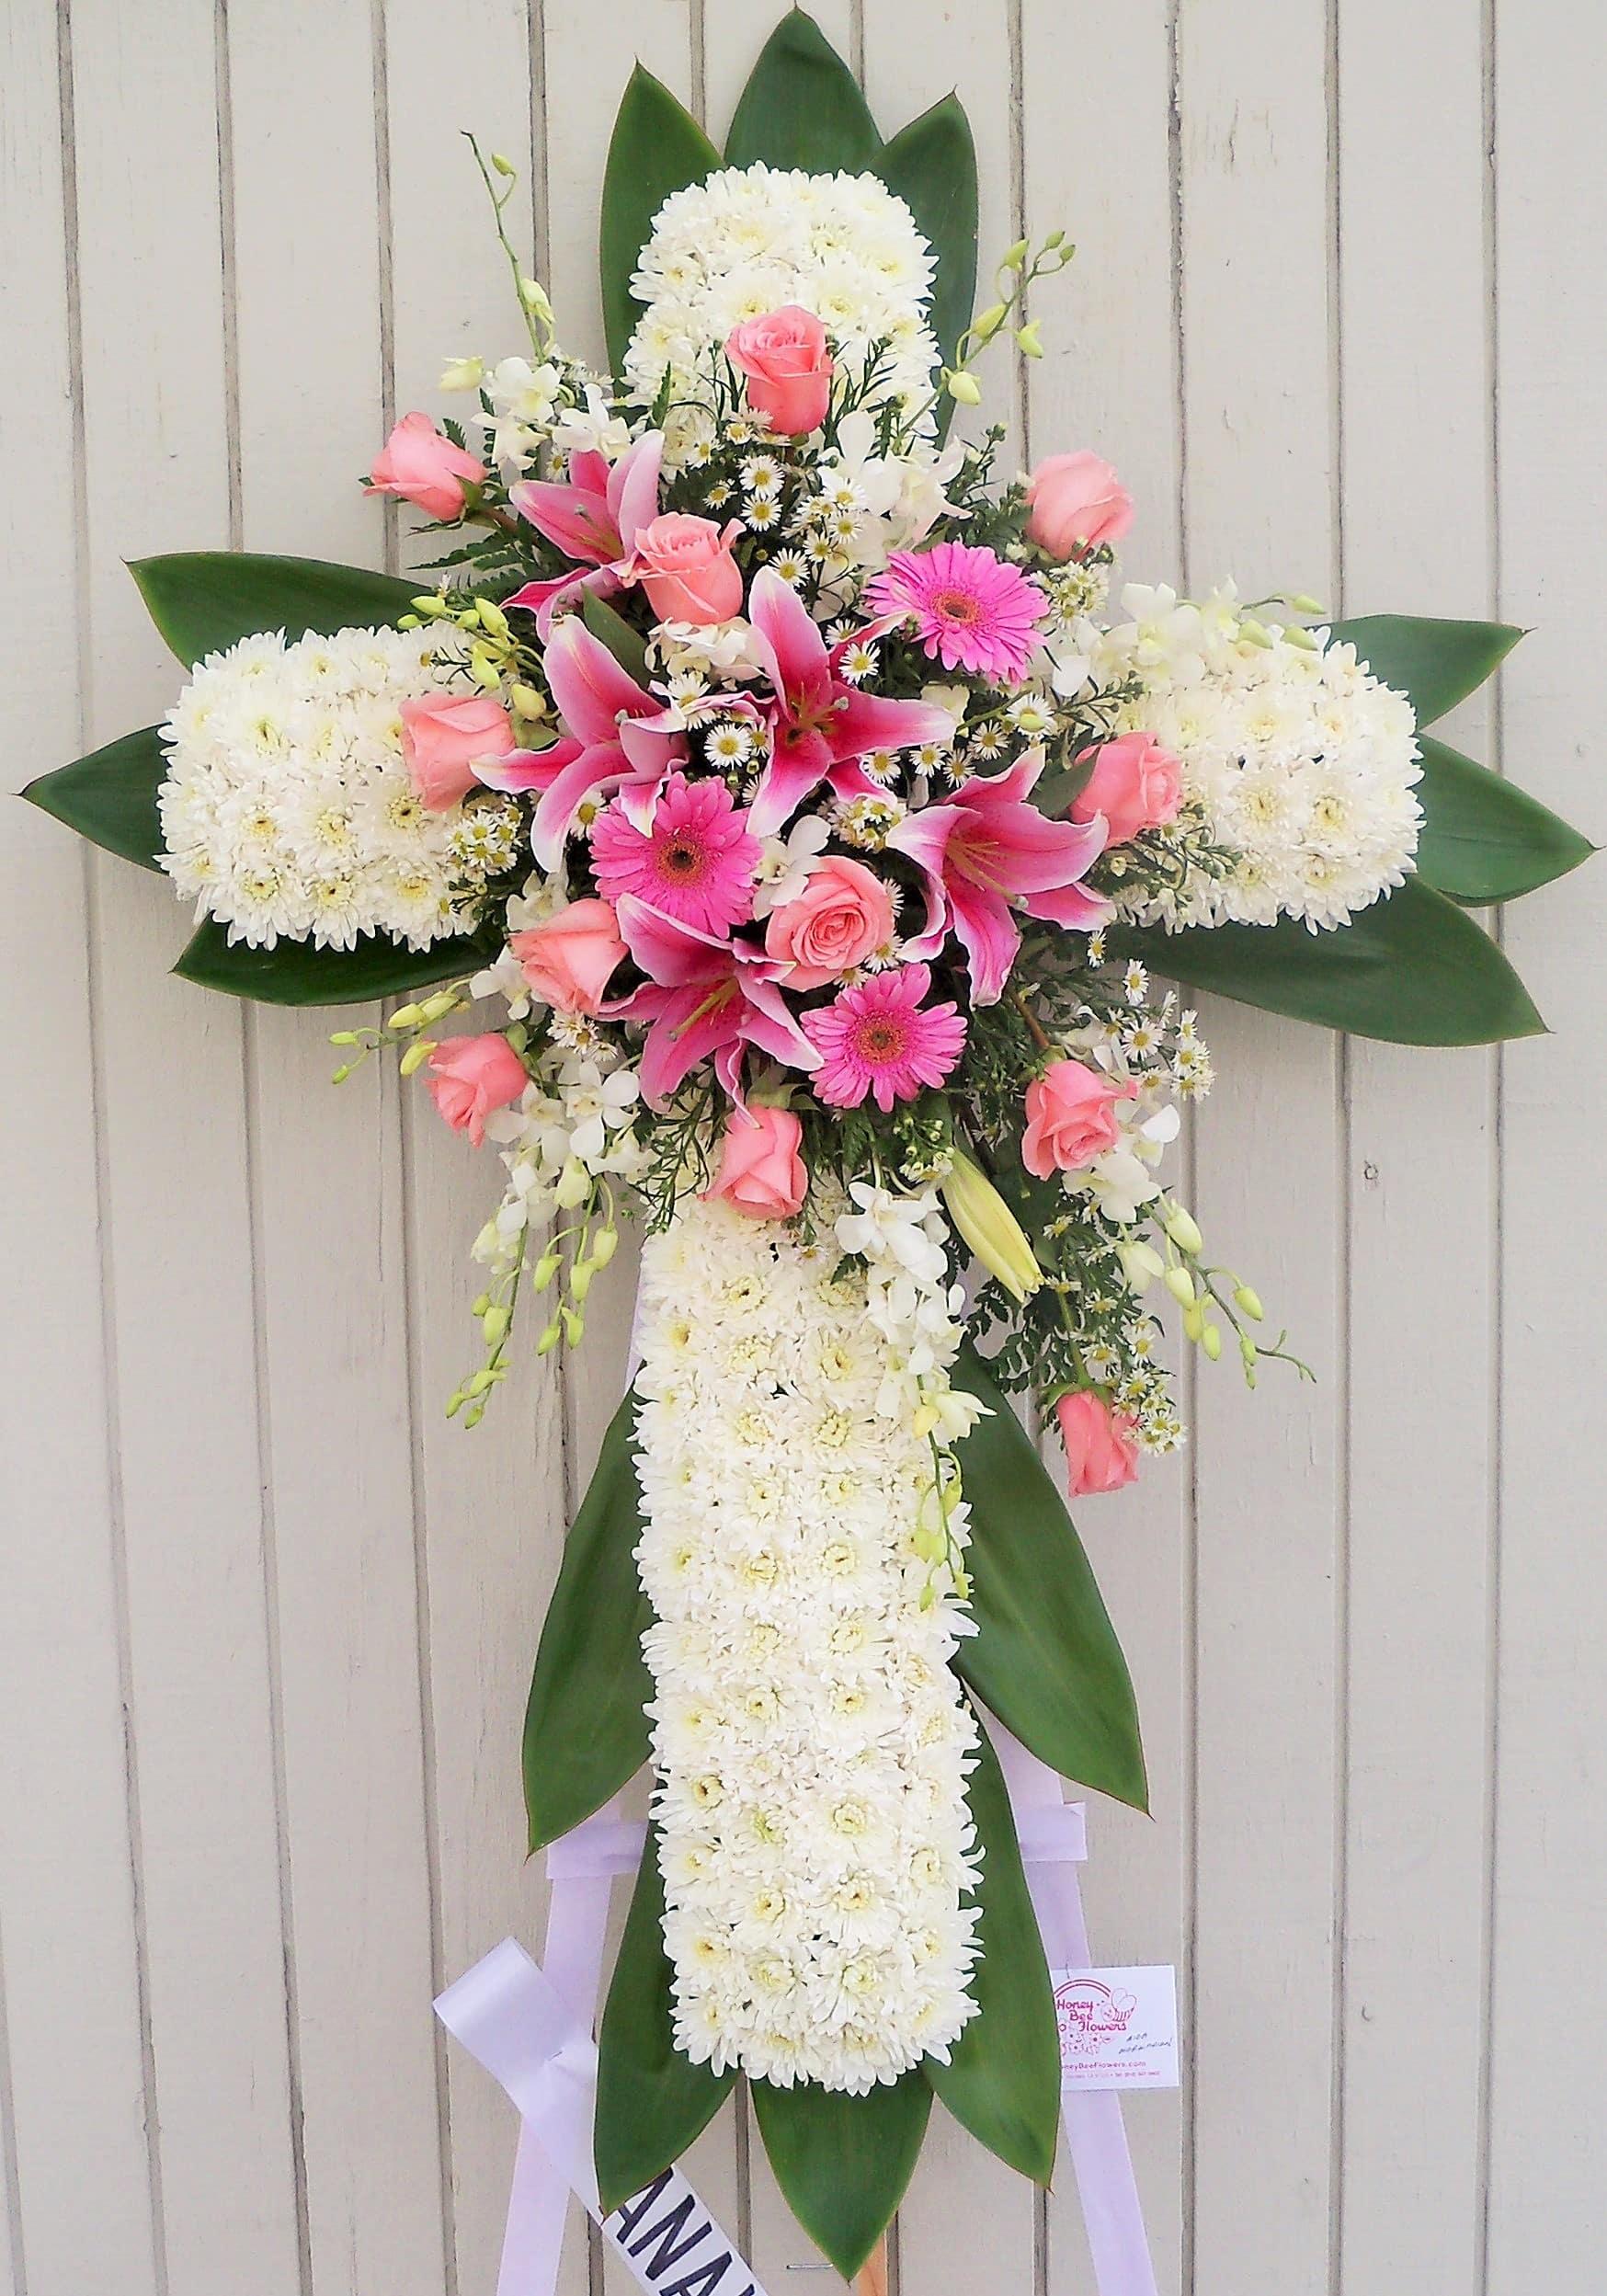 Funeral Cross (Sympathy) in Glendale, CA